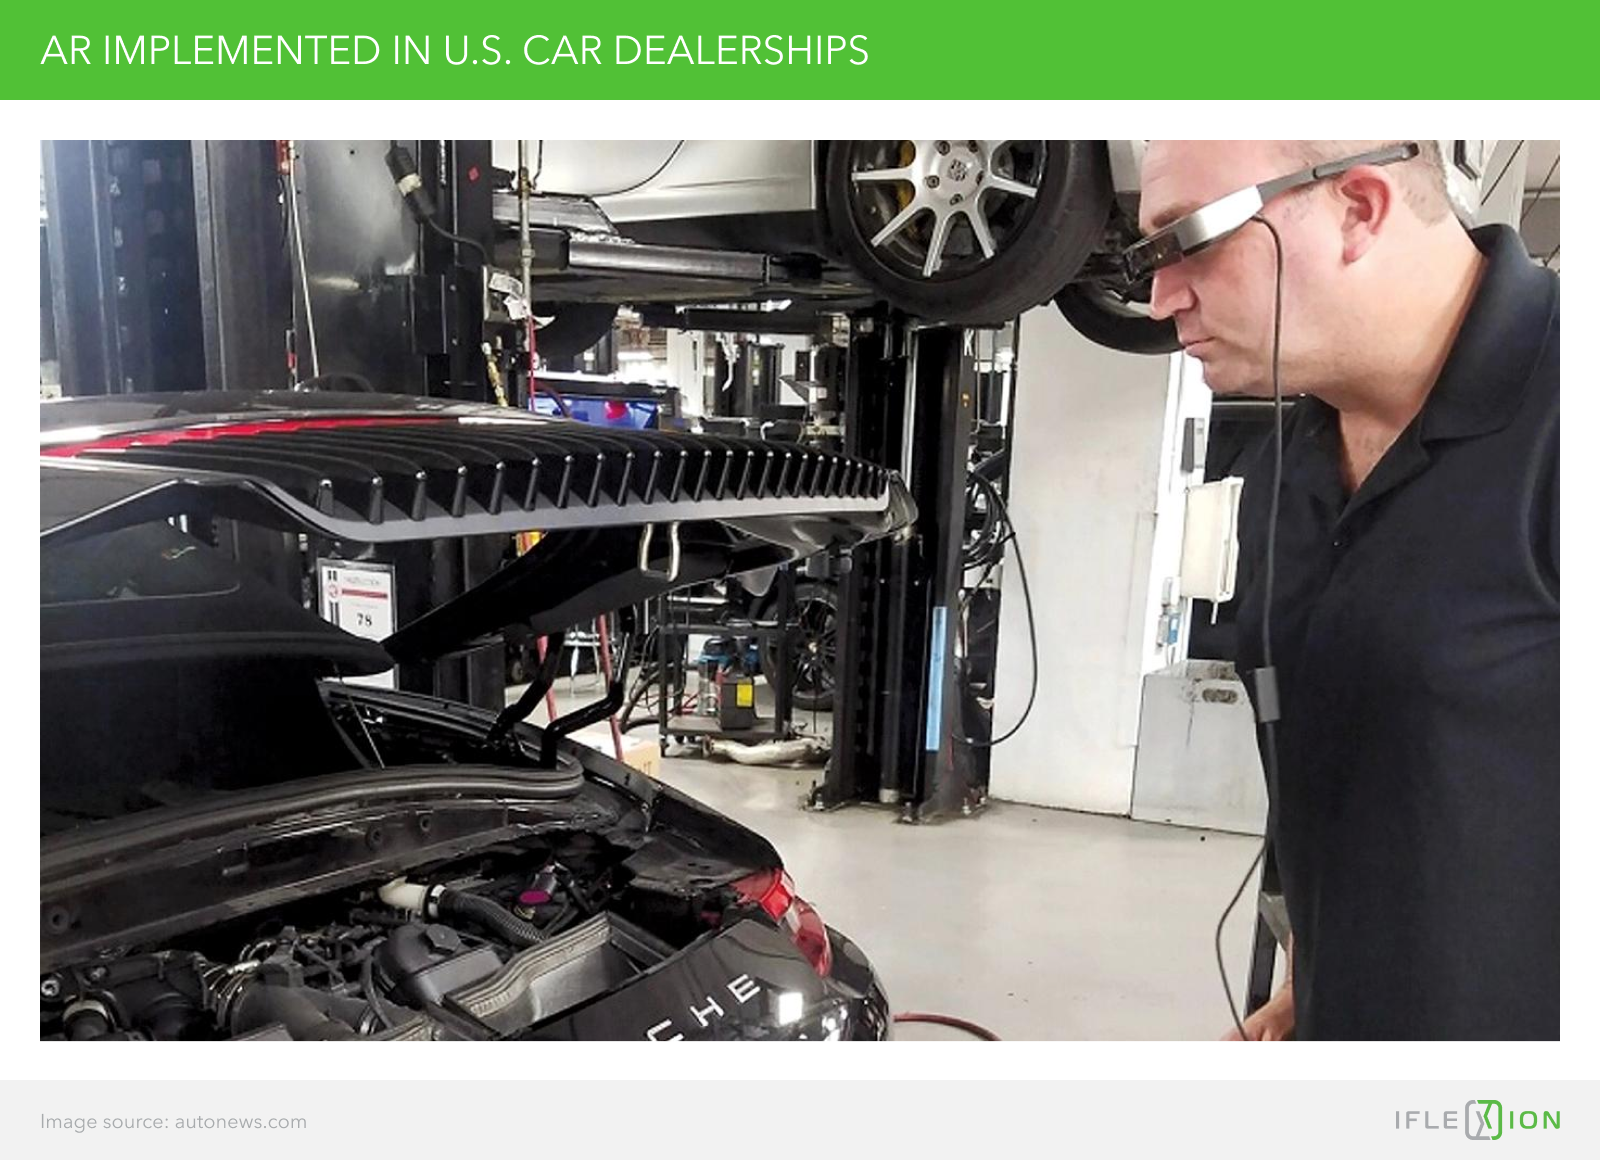 AR in US car dealerships